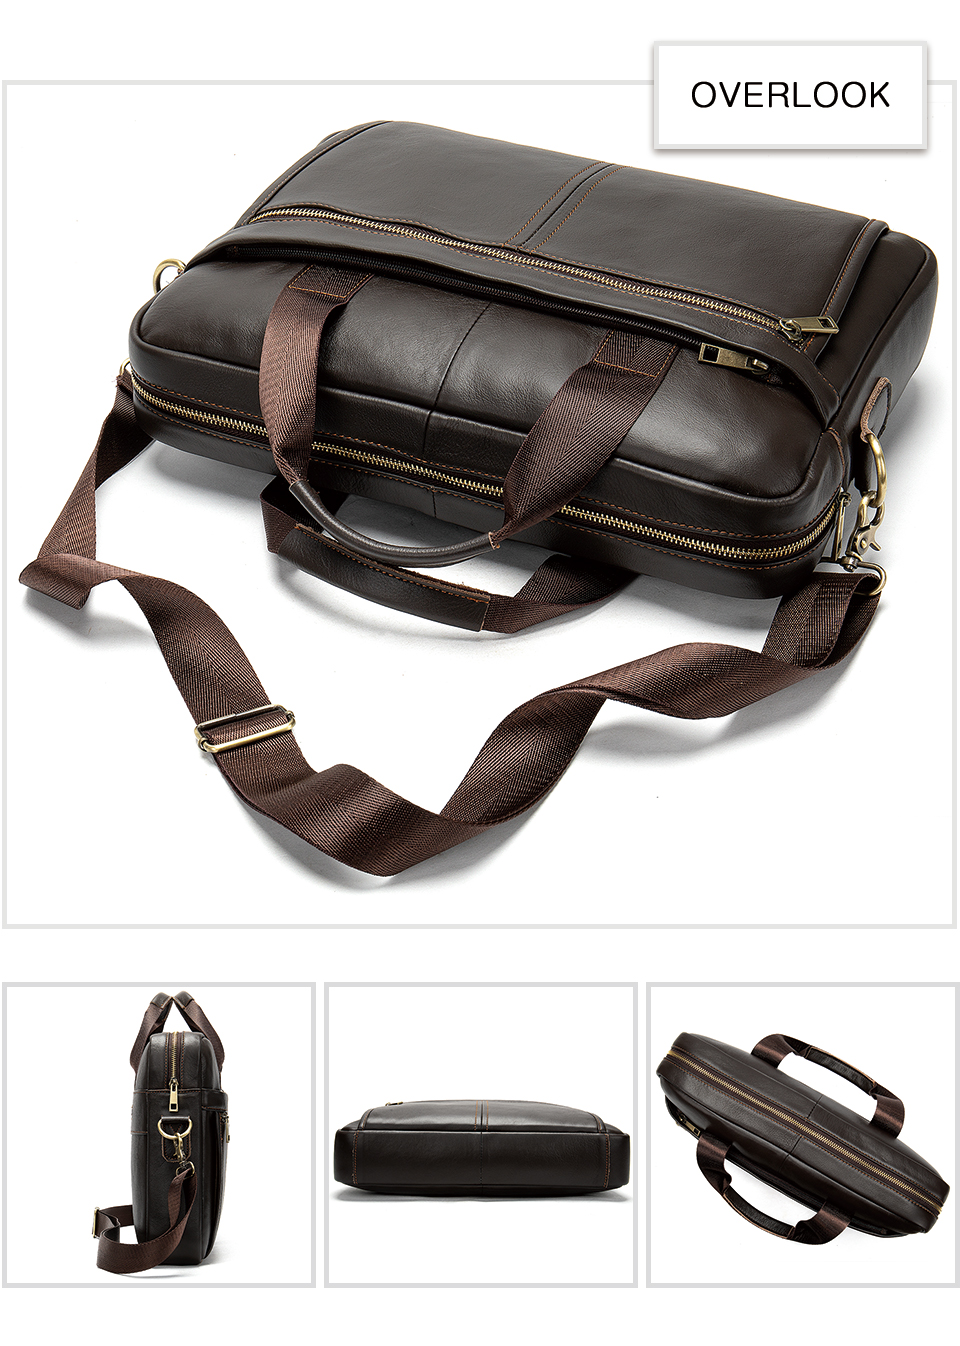 HTB19s8VV7voK1RjSZFwq6AiCFXaM WESTAL Men's Briefcase Men's Bag Genuine Leather Laptop Bag Leather Computer/Office Bags for Men Document Briefcases Totes Bags